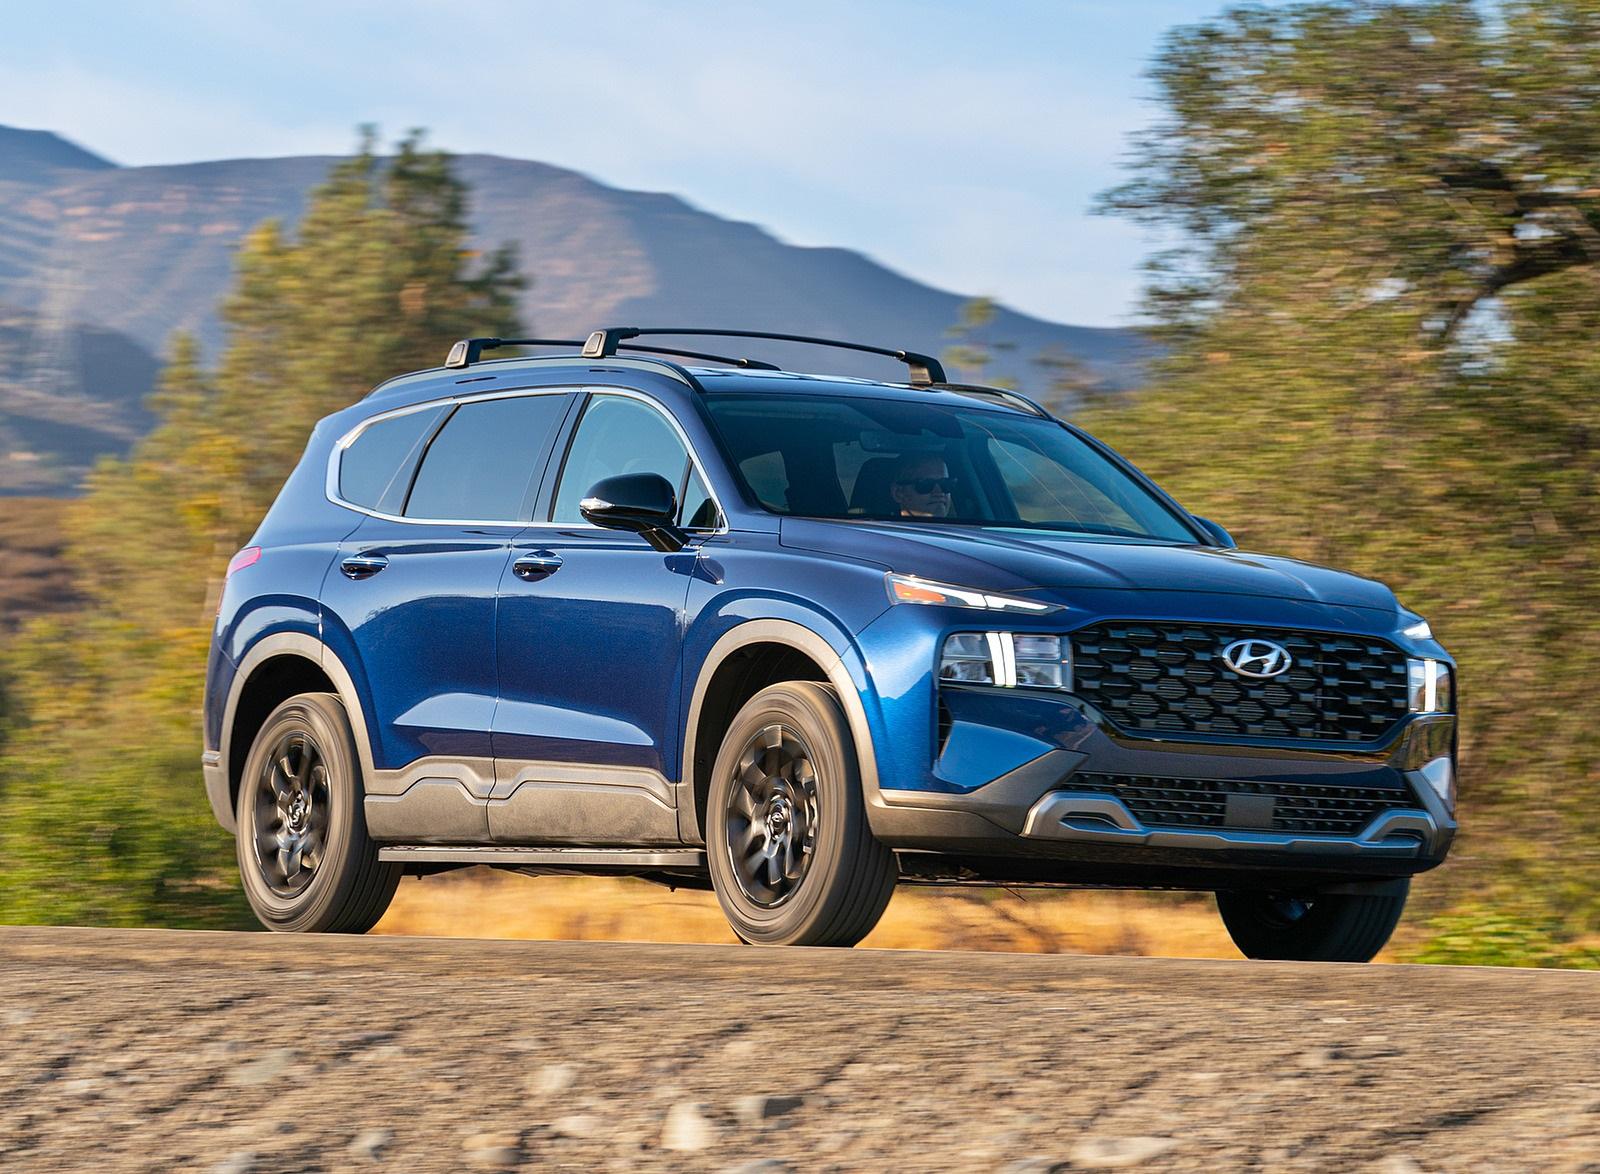 2022 Hyundai Santa Fe XRT Front Three-Quarter Wallpapers (1)